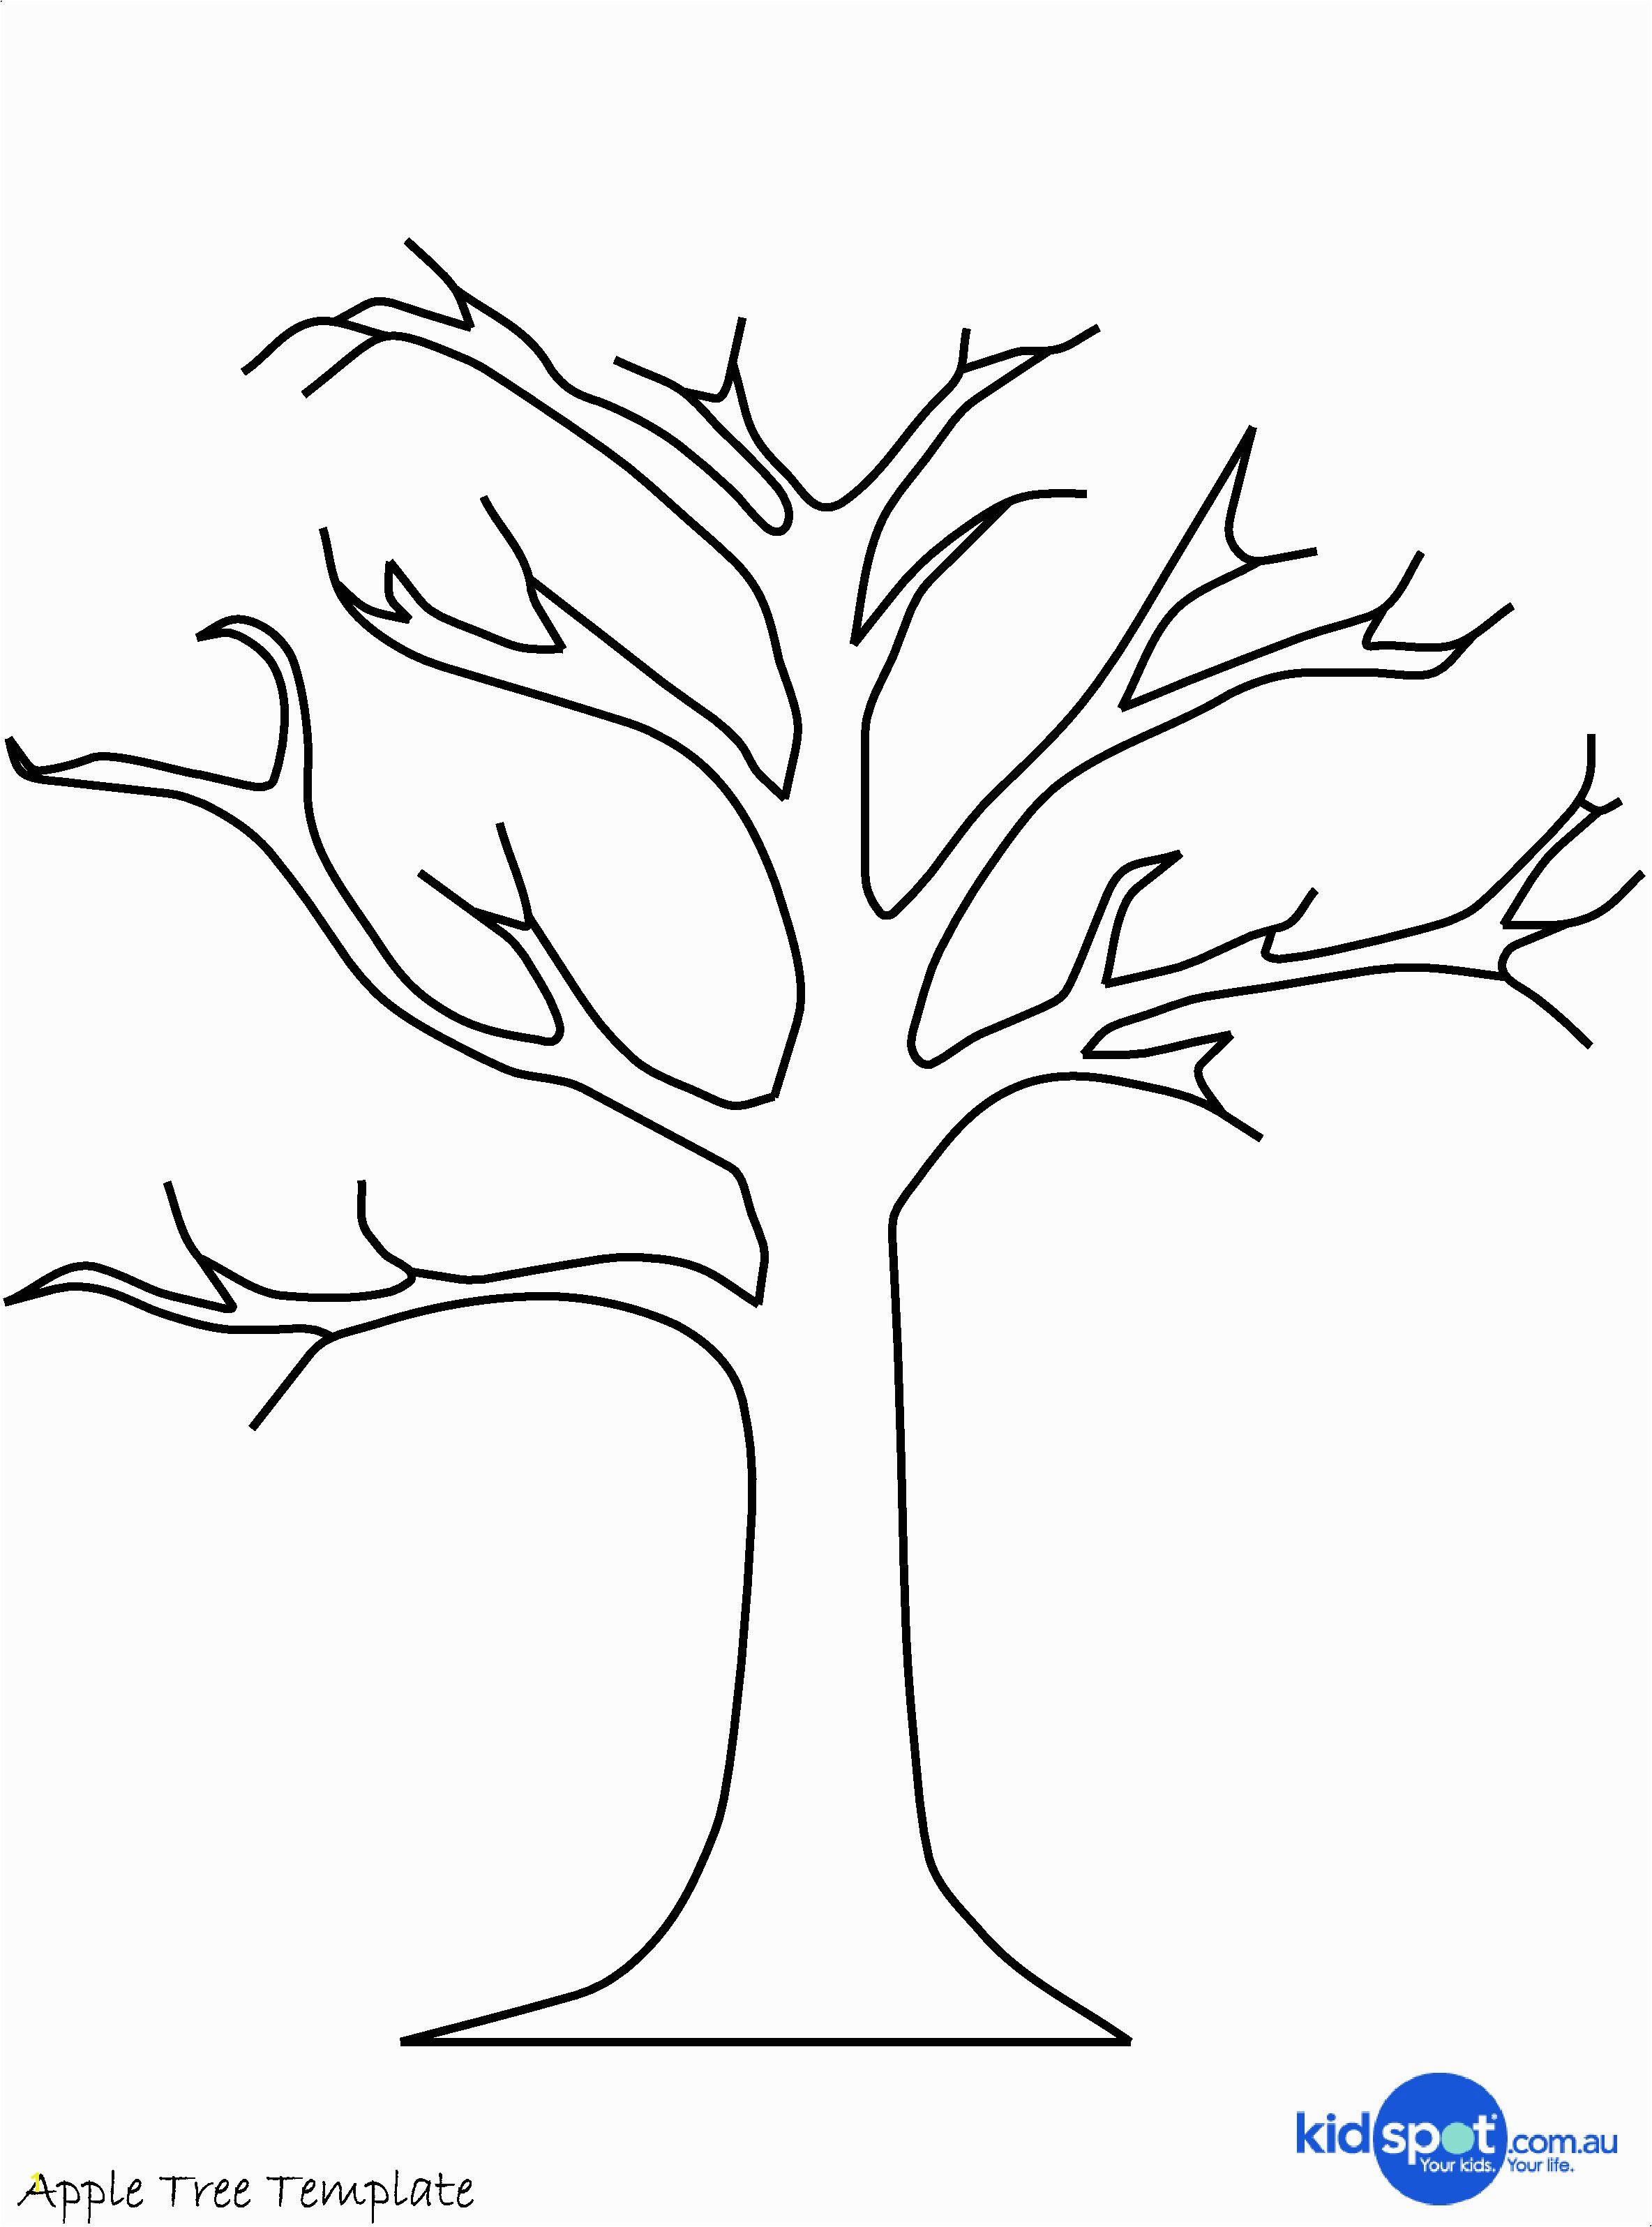 tree craft cork stamp apple tree tree crafts craft free and tree art